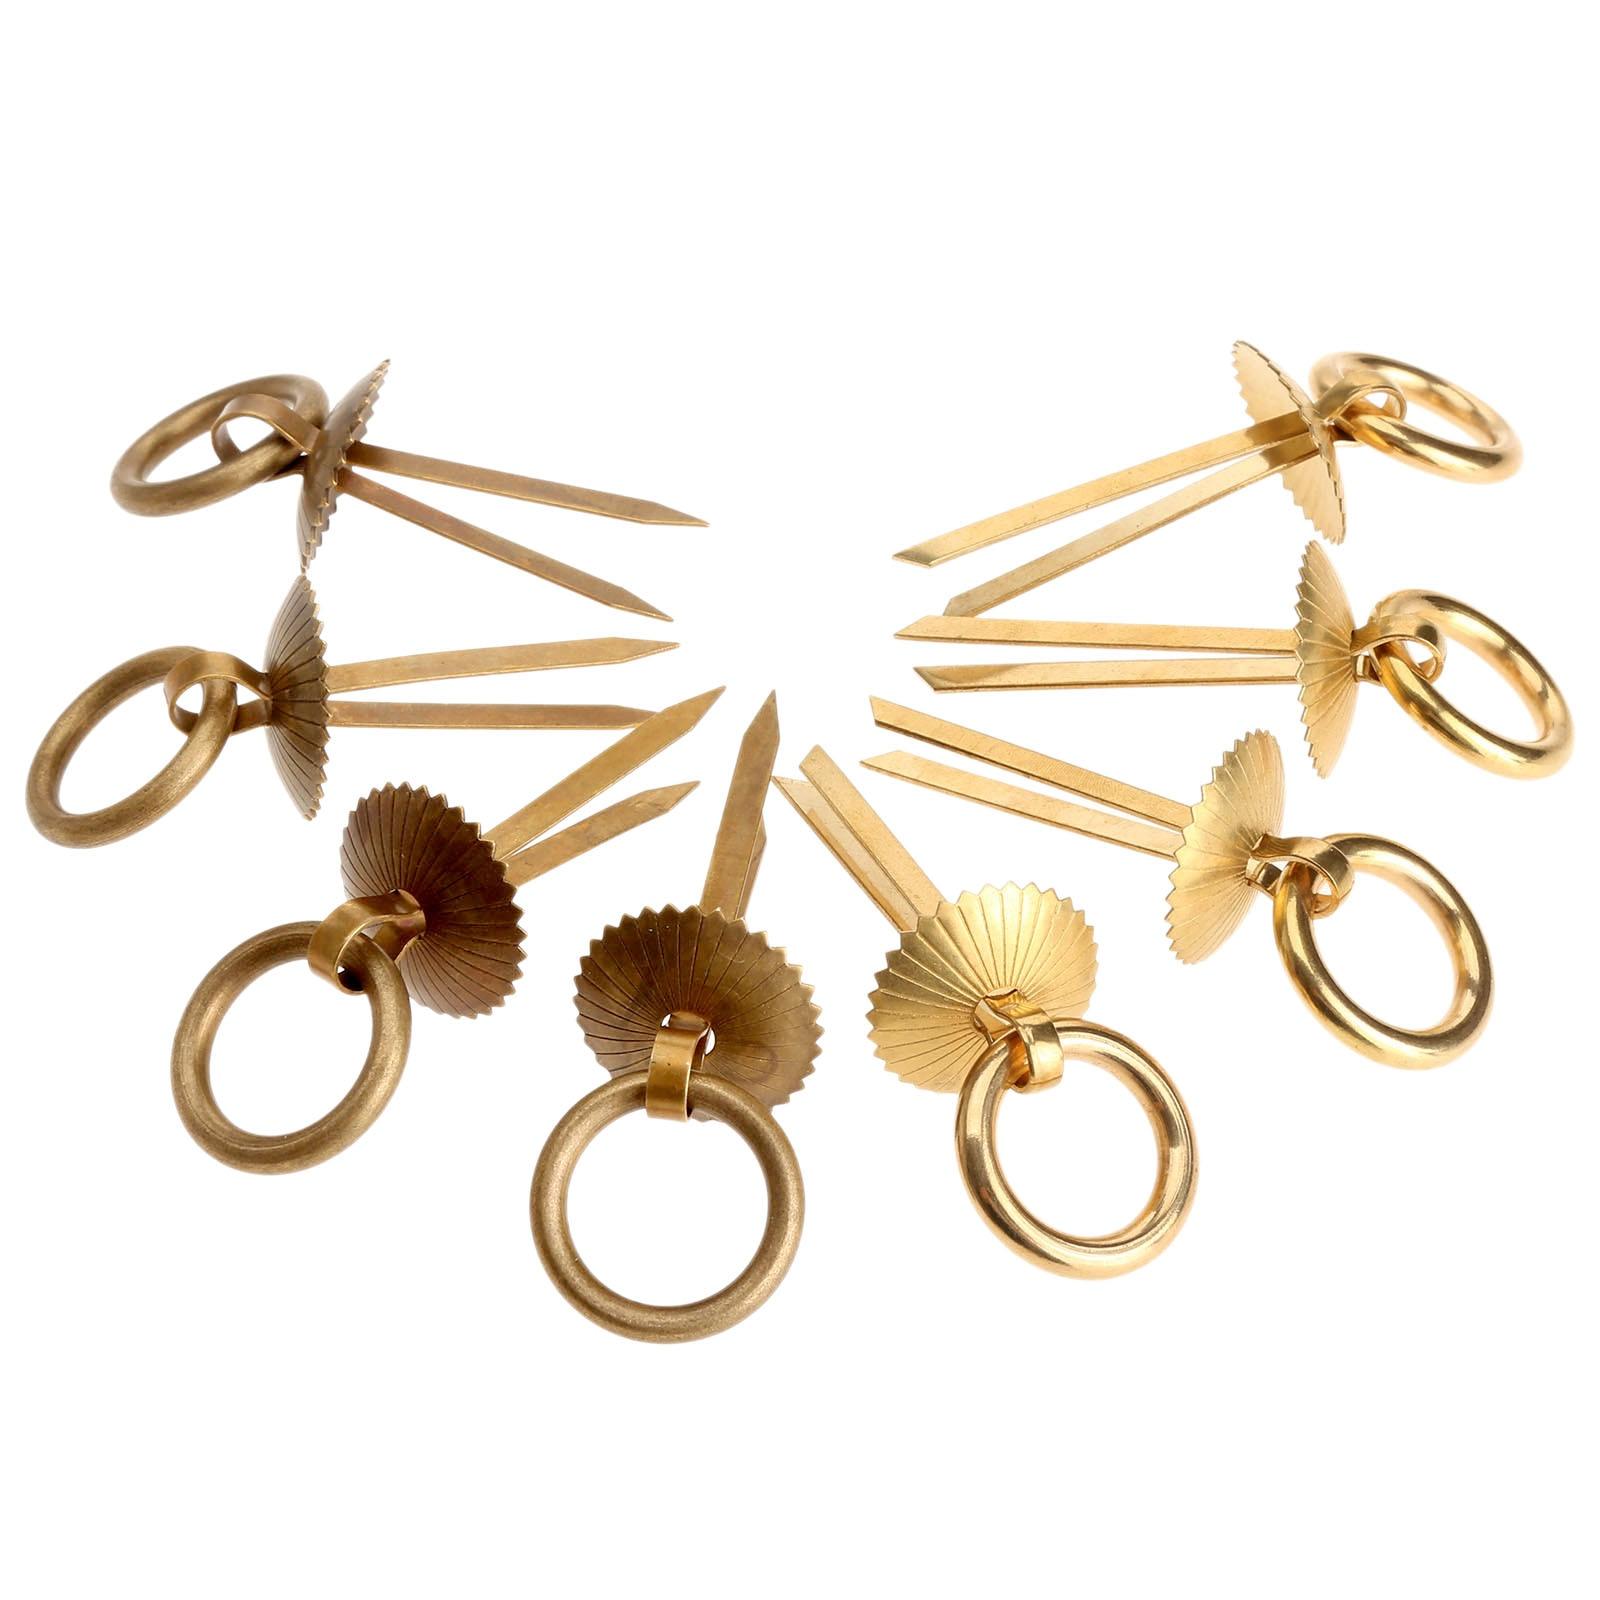 online cheap brass rings handles aliexpress alibaba group